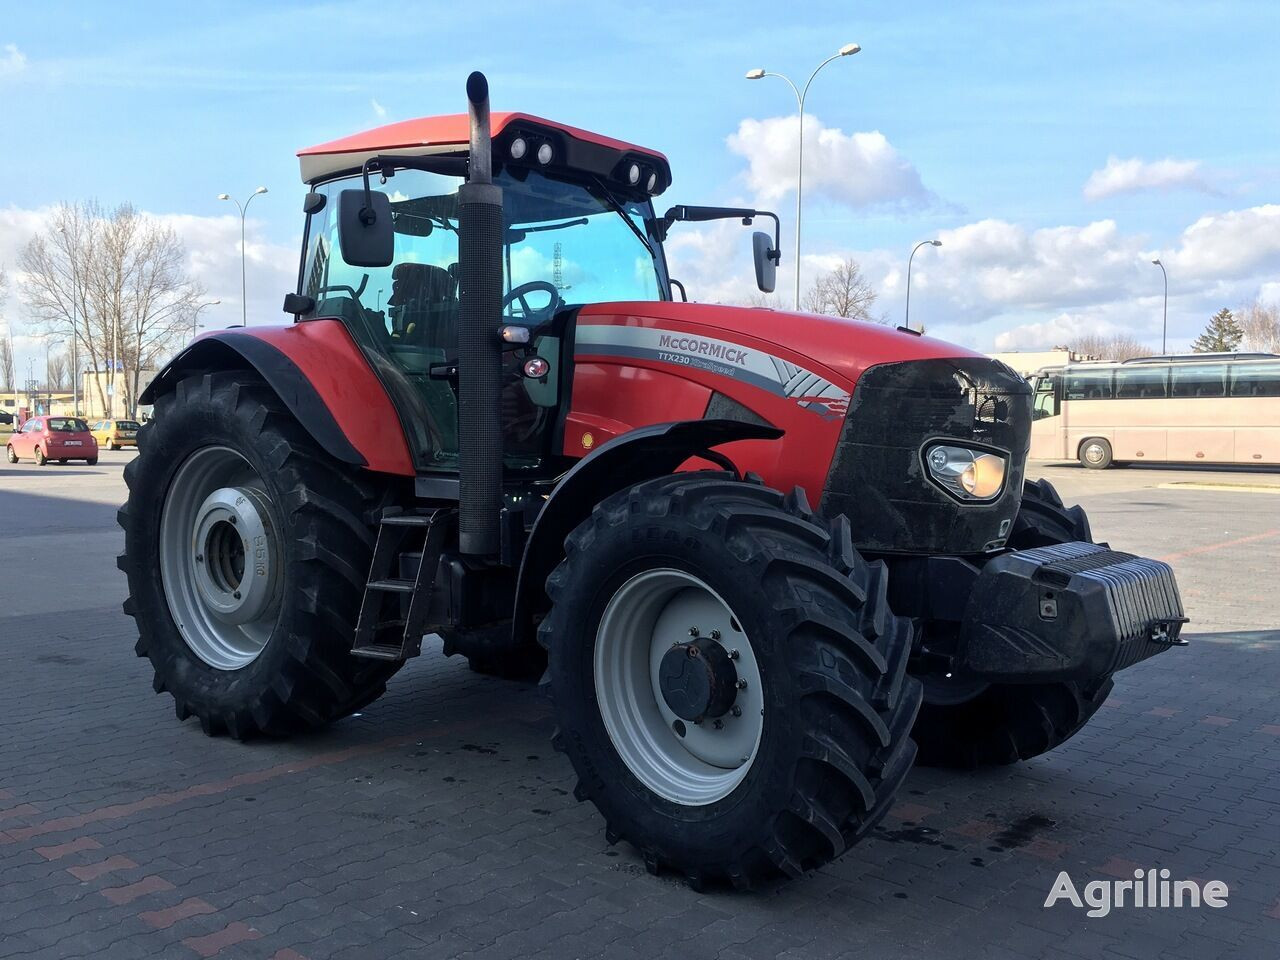 MCCORMICK TTX 230 XTRASPEED tractor de ruedas